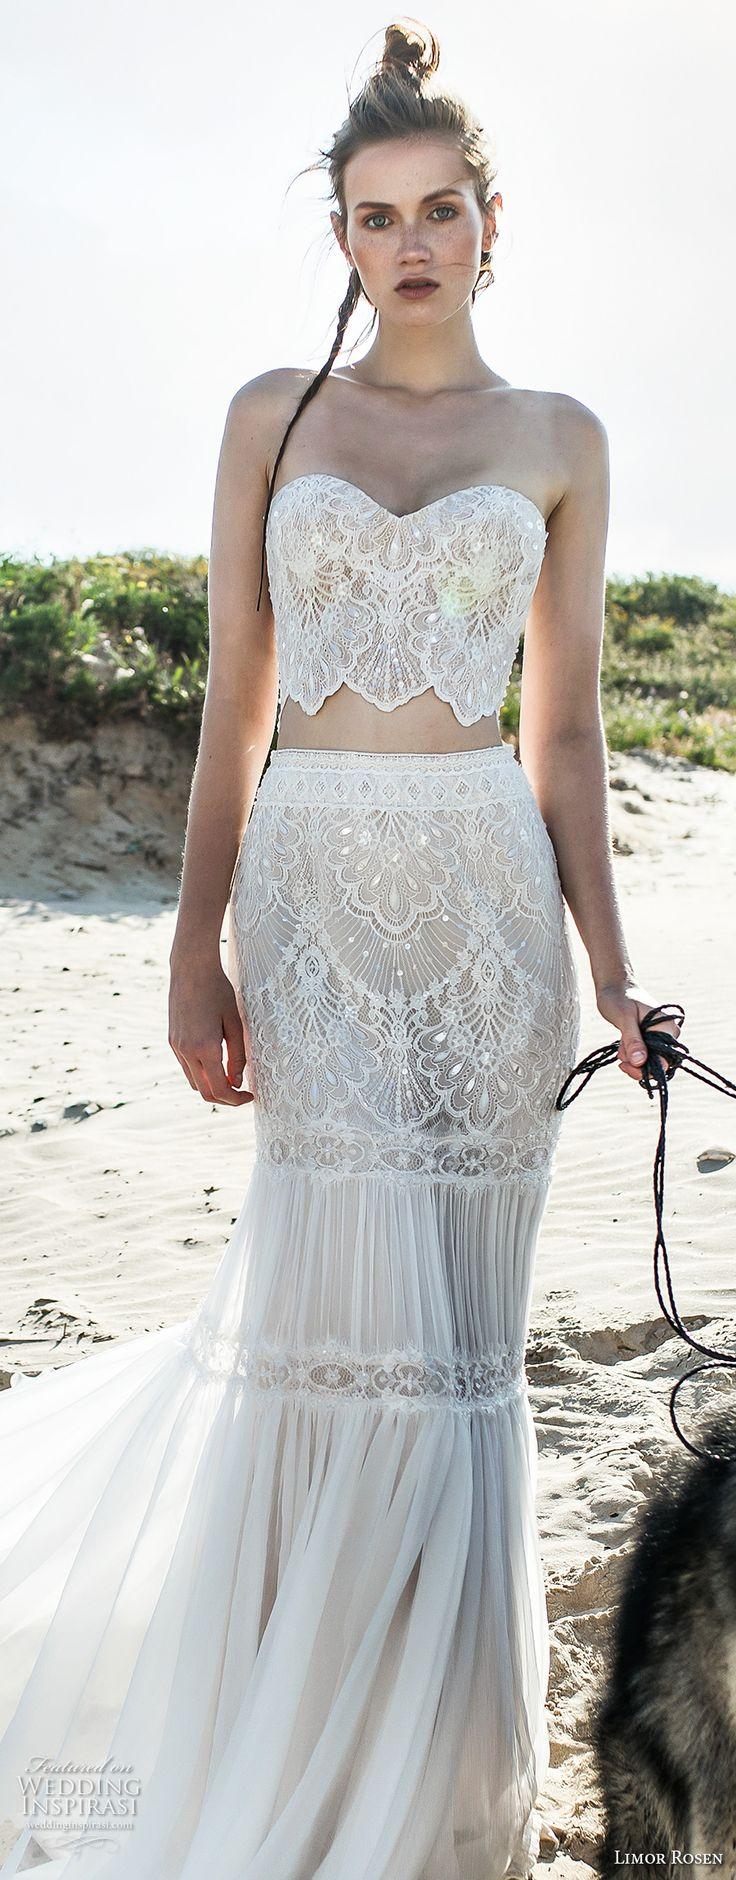 2 piece crop top wedding dress   best bridal images on Pinterest  Bridal gowns Wedding